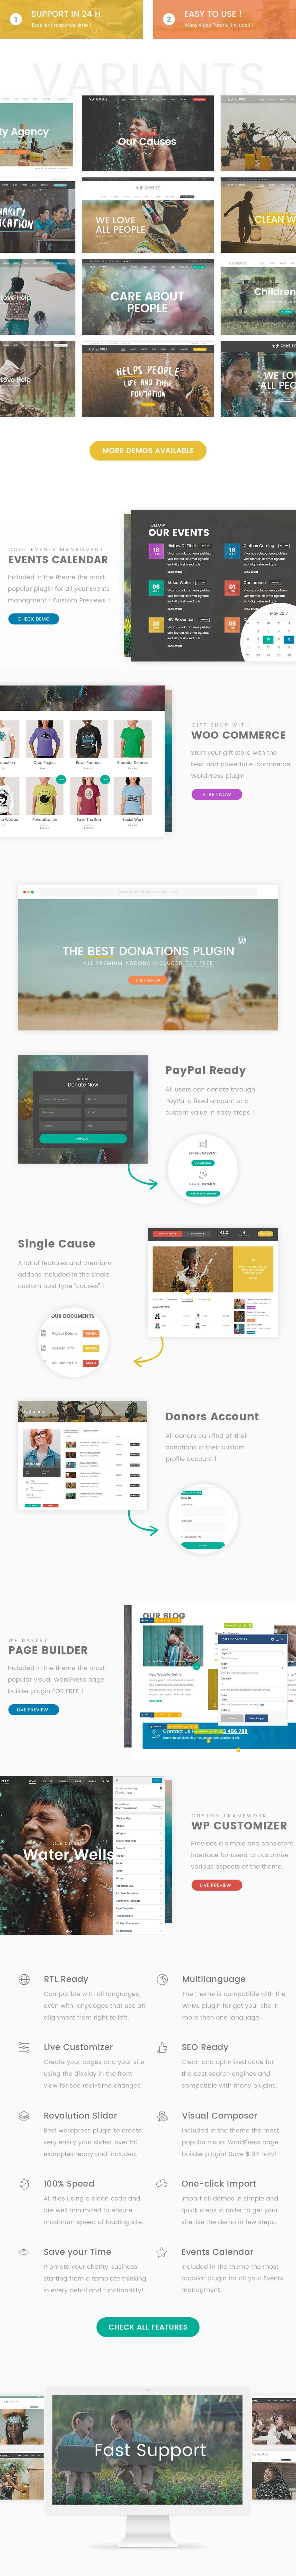 Charity Foundation - Charity Hub WP Theme - 1